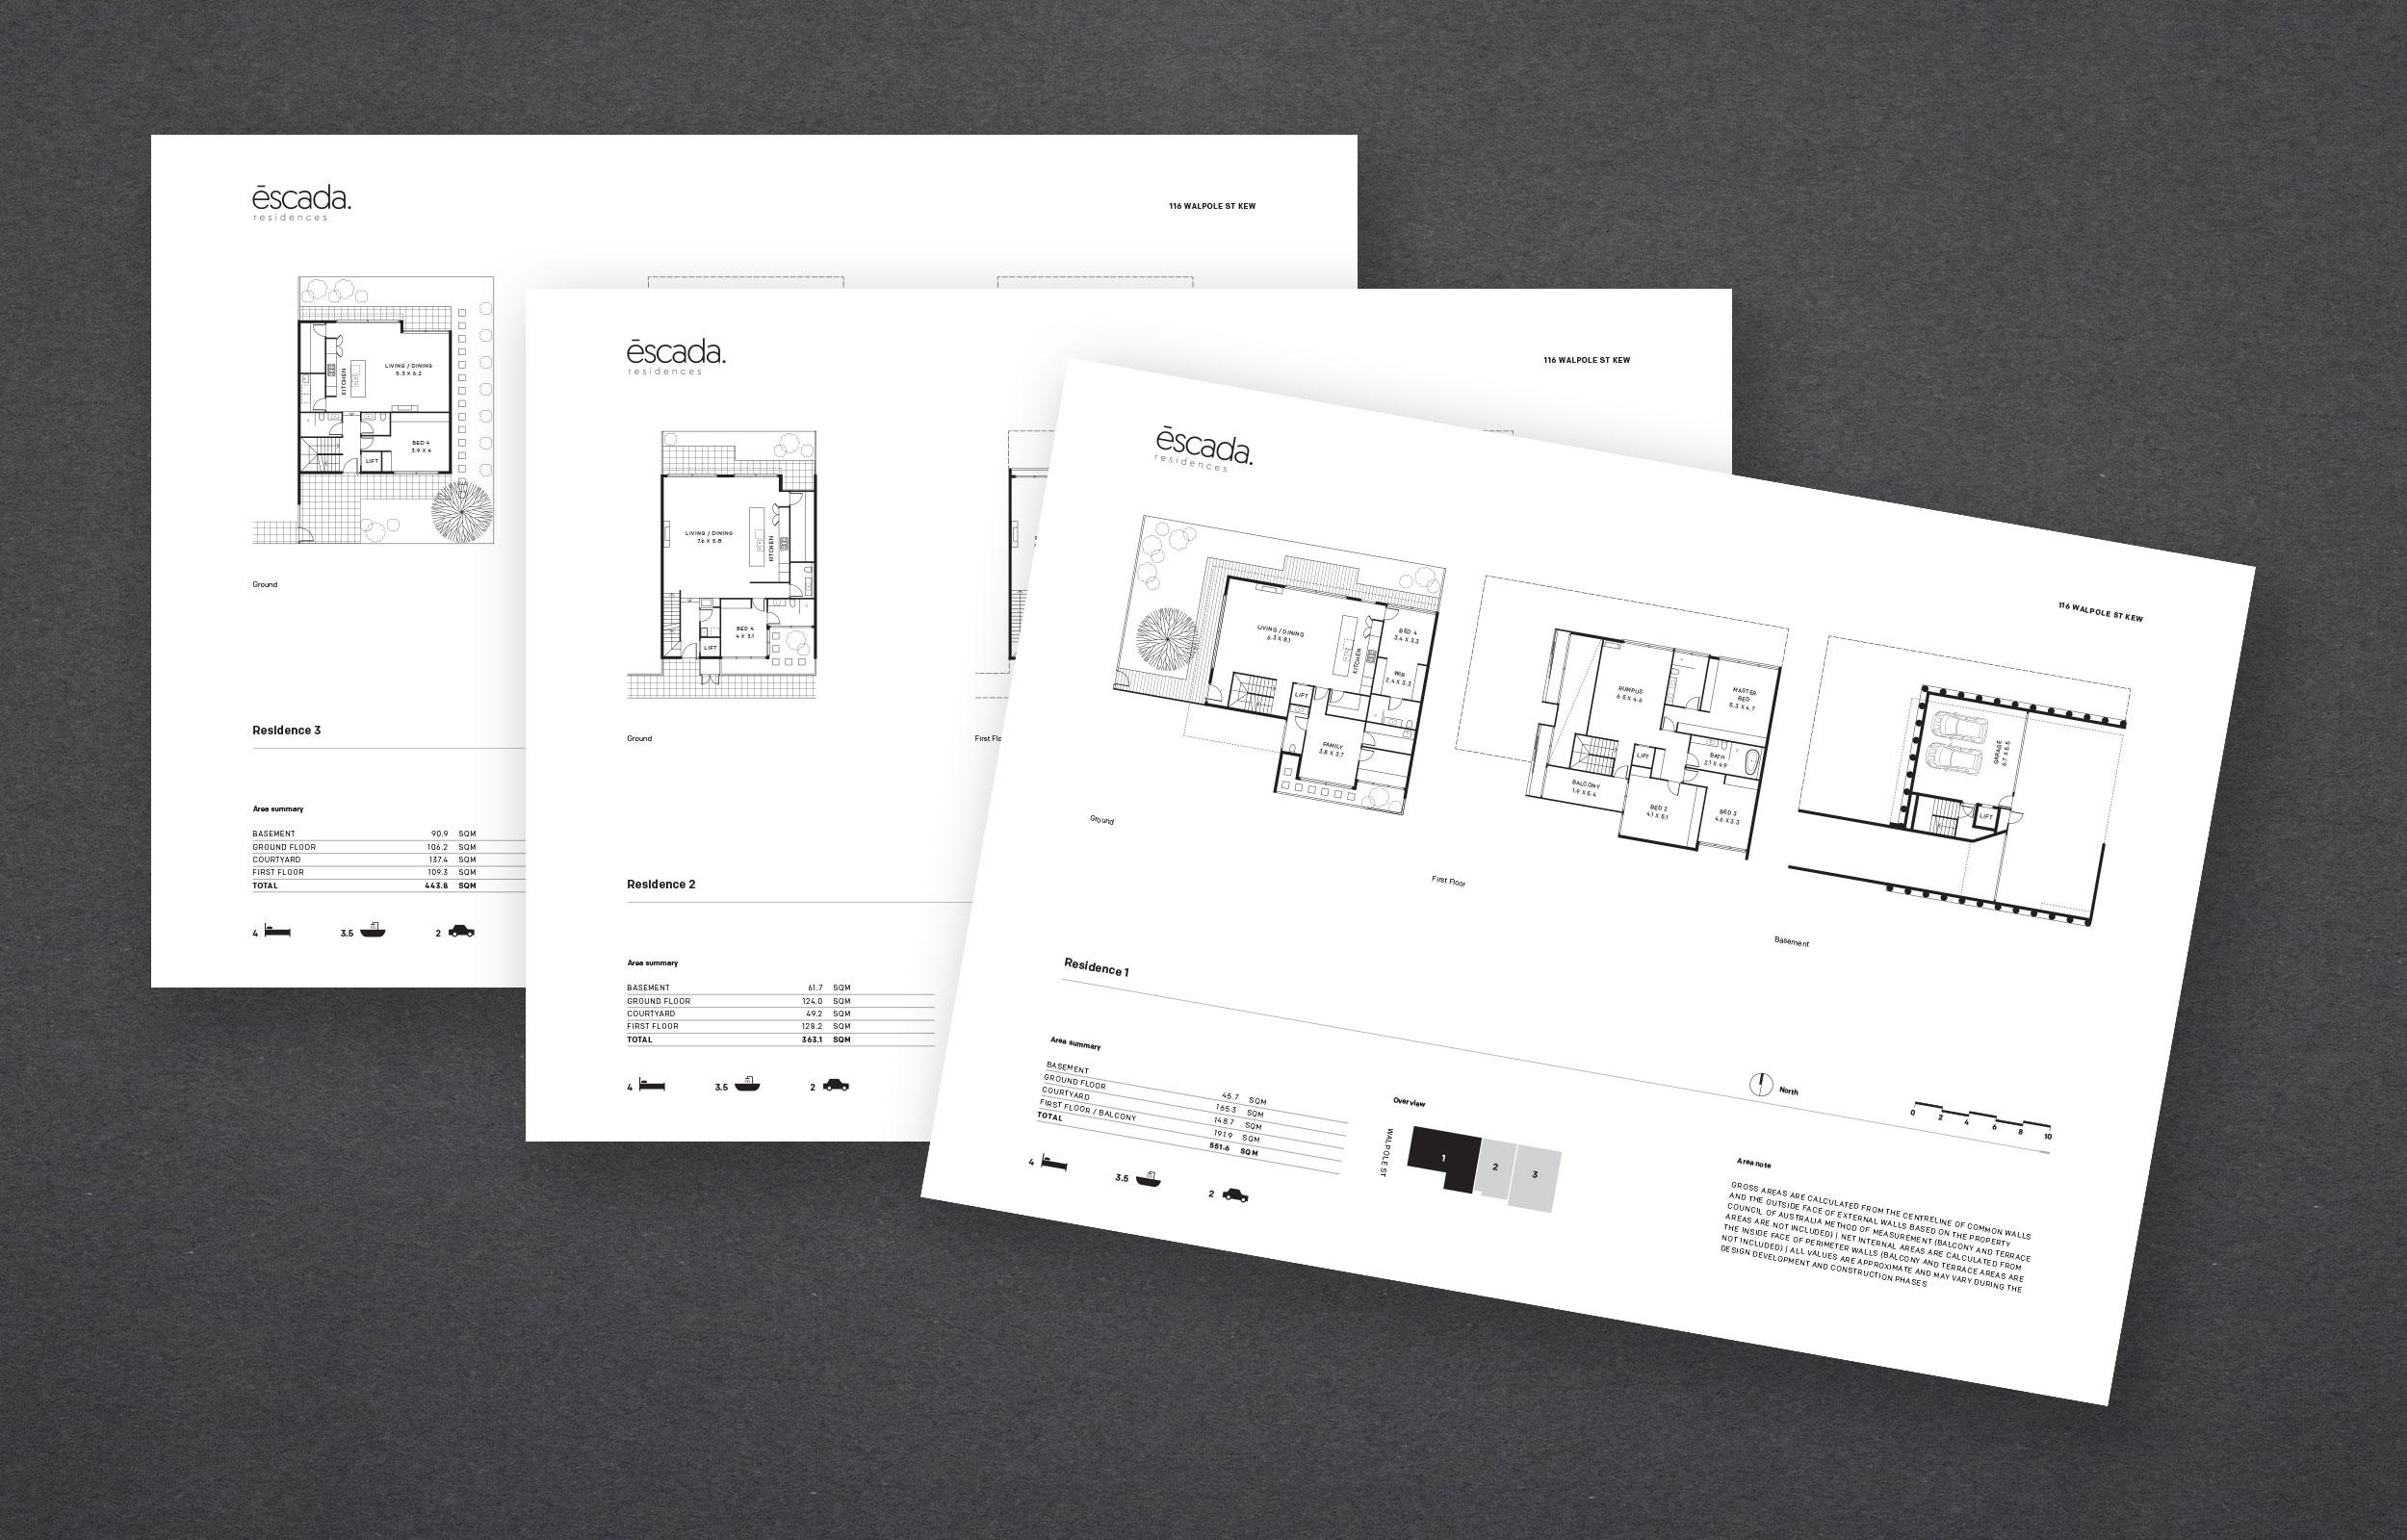 enoki-graphic-escada-5.jpg